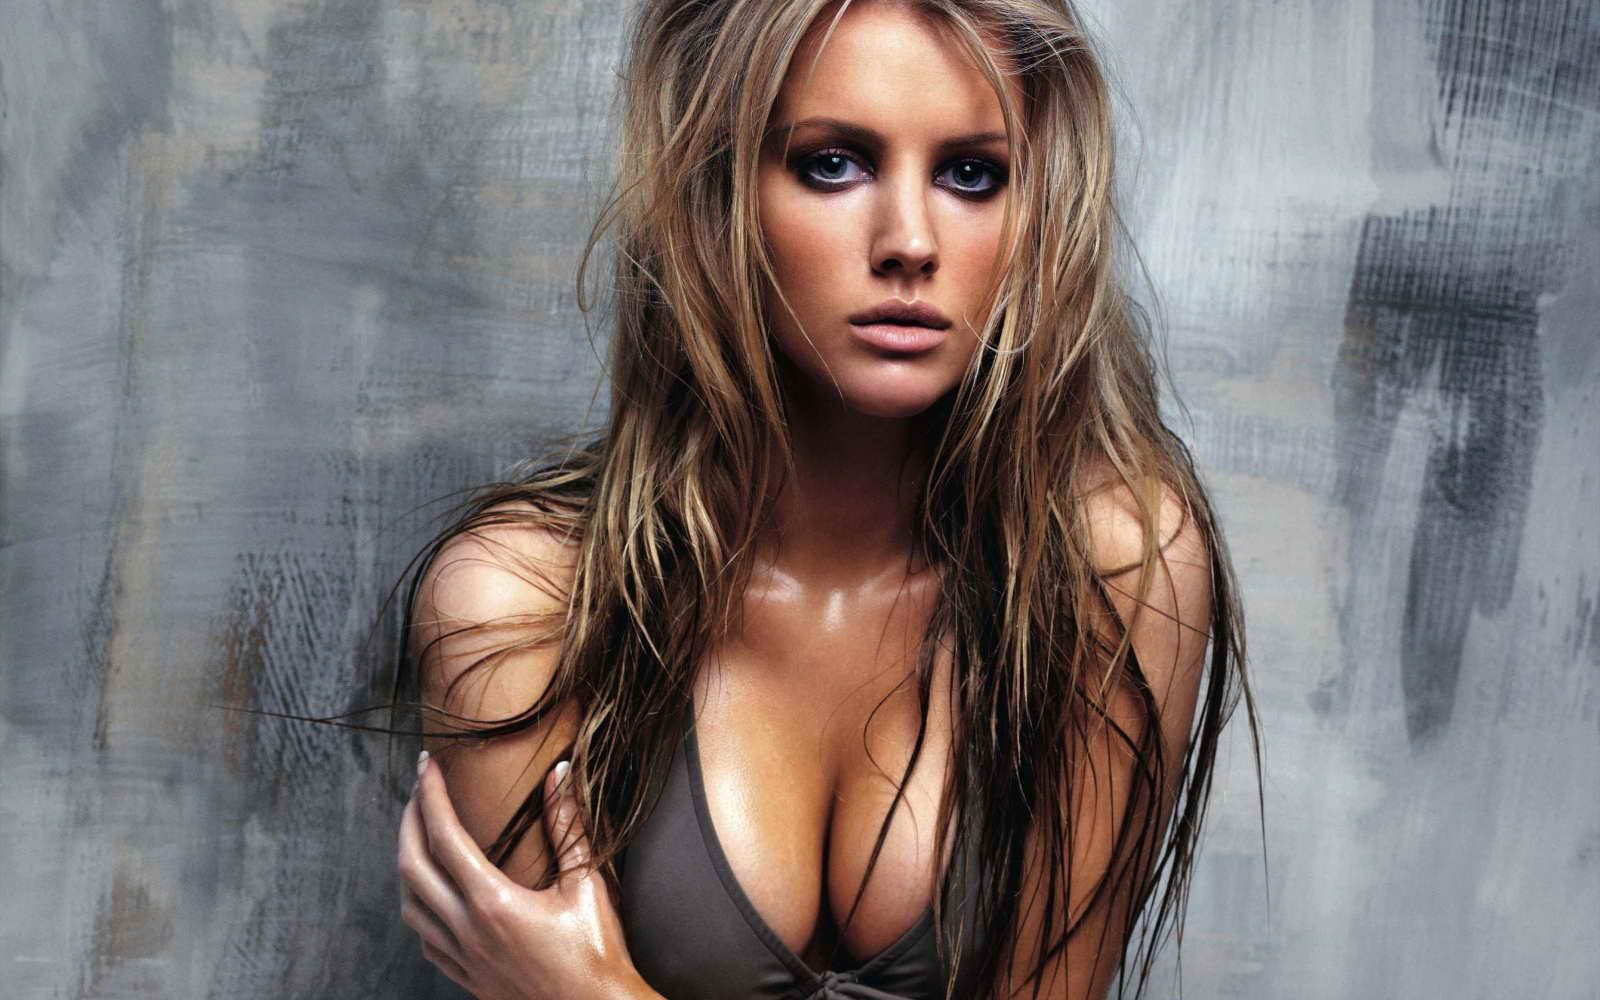 Hot Woman Wallpaper Ashley Mulheron 3242179 Hd Wallpaper Backgrounds Download